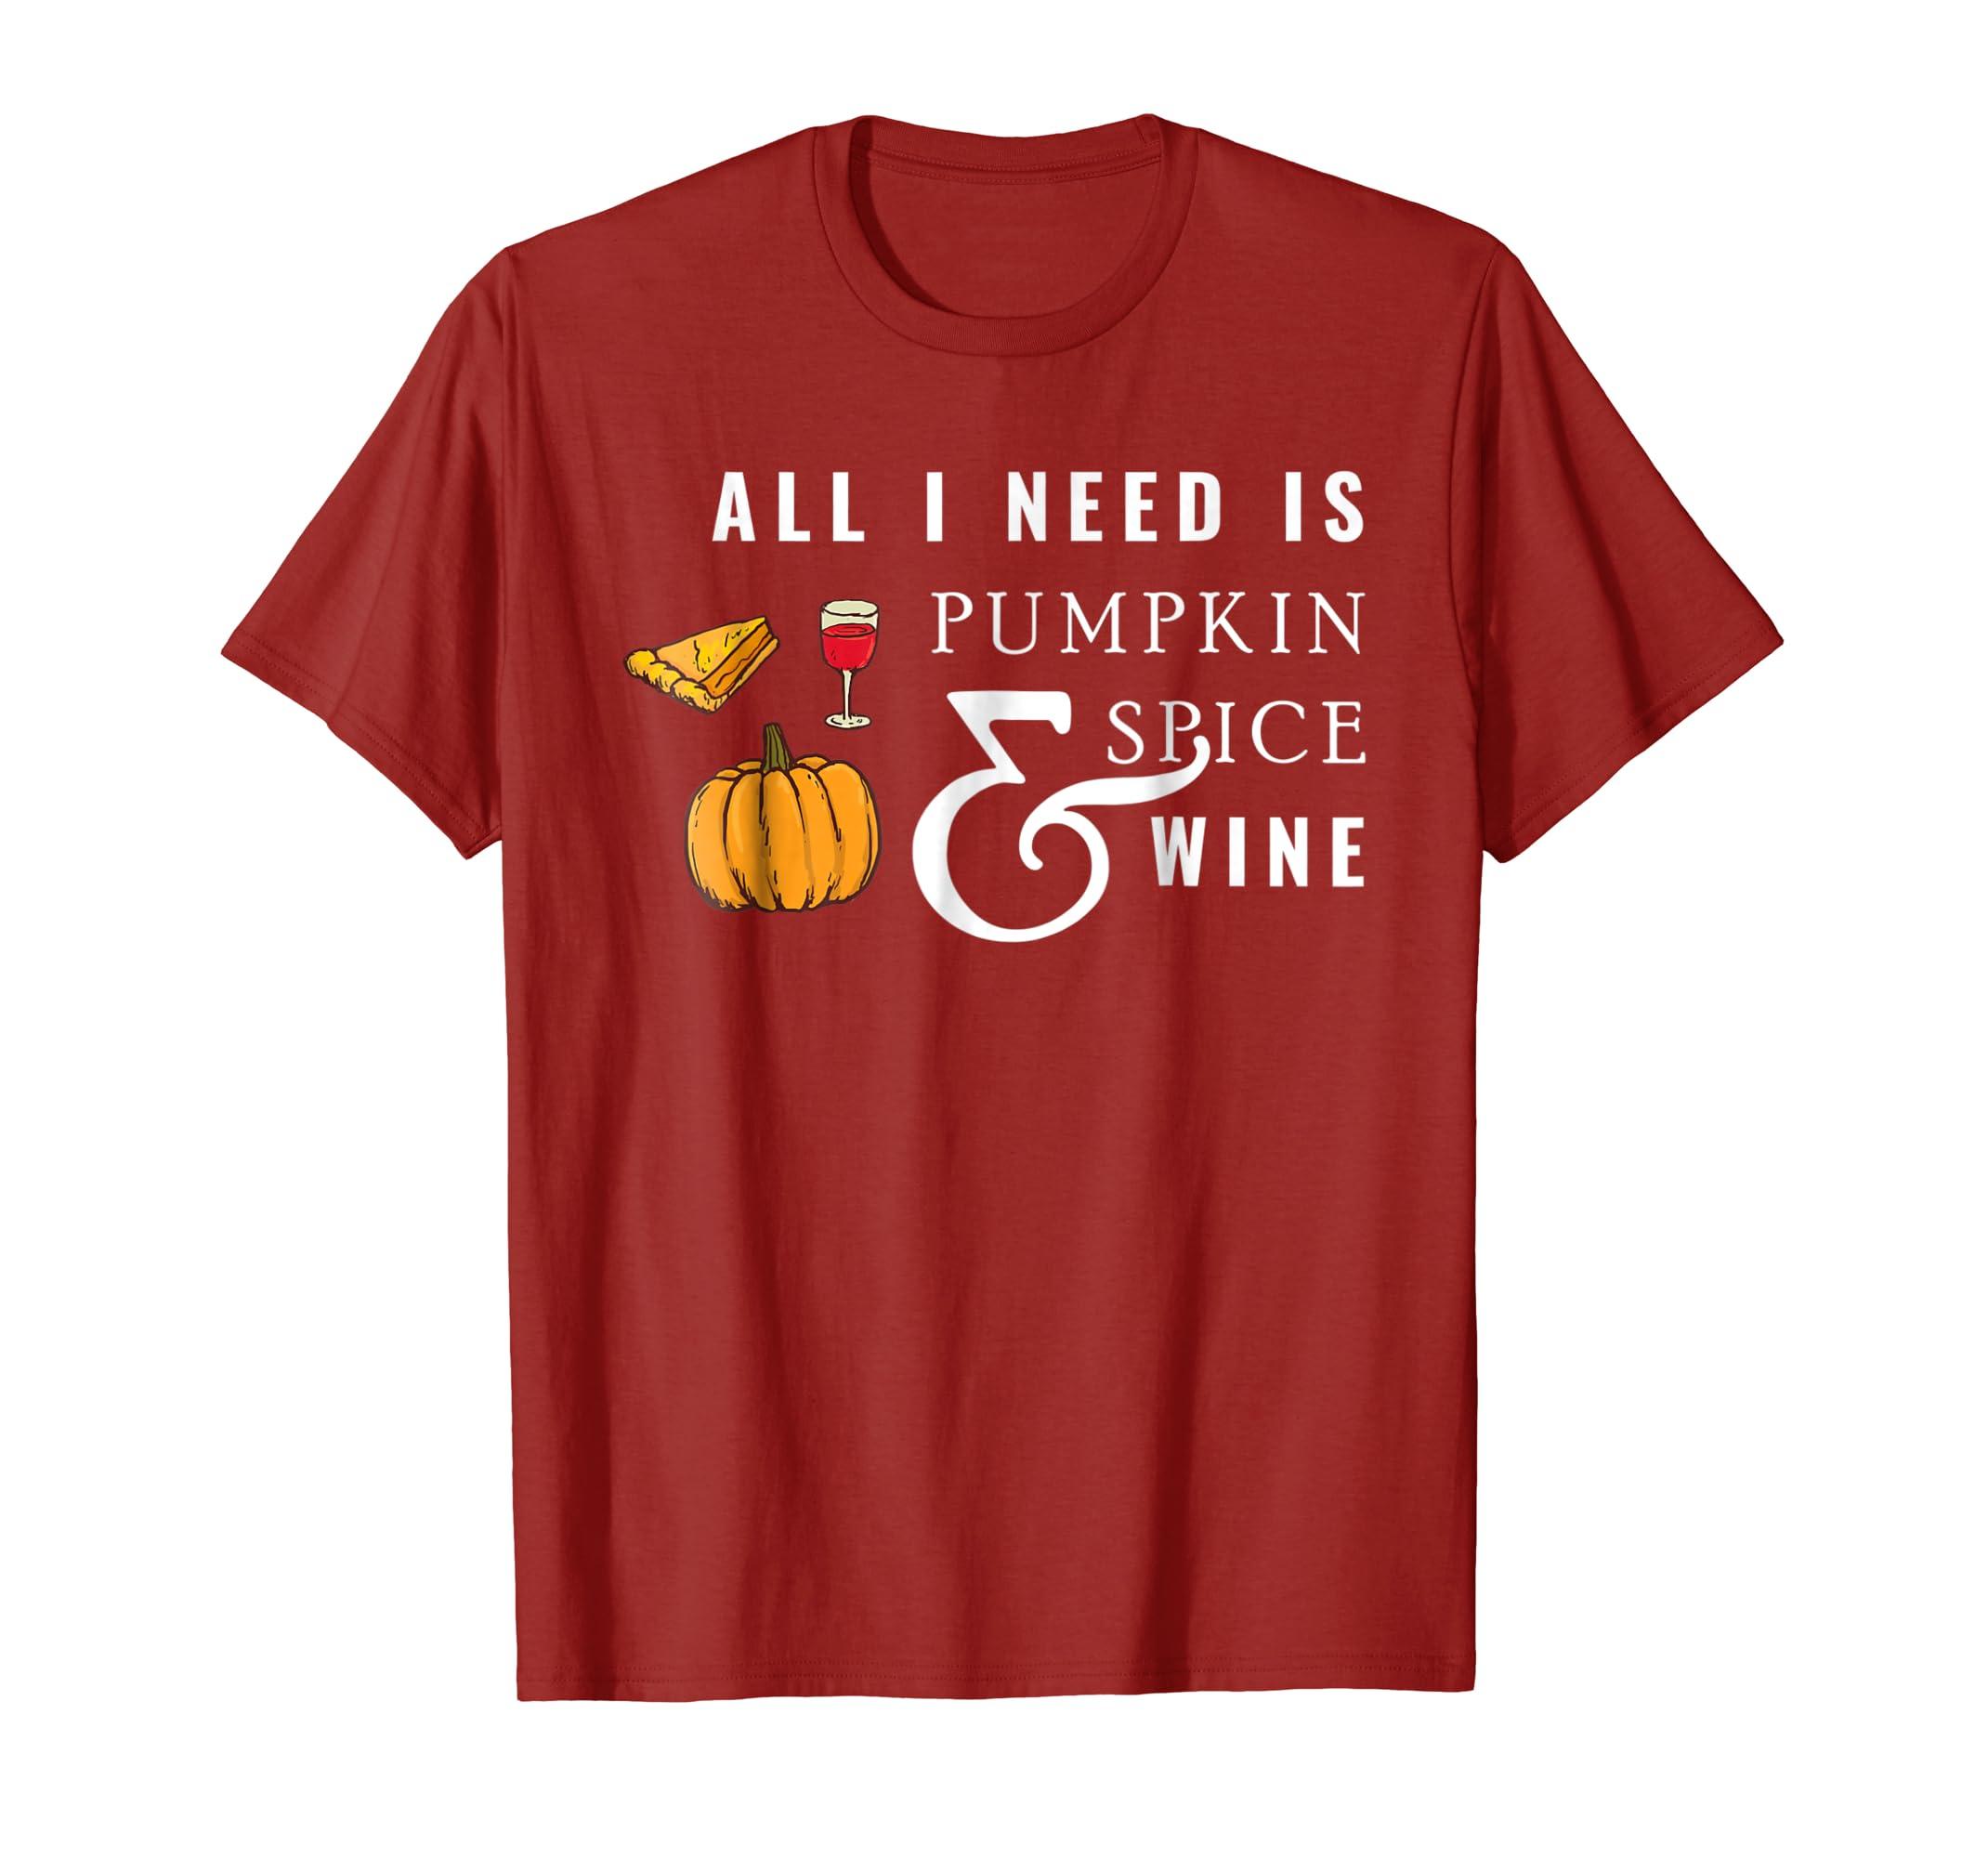 All I Need Is Pumpkin Spice and Wine Seasonal Autumn Shirt-ln